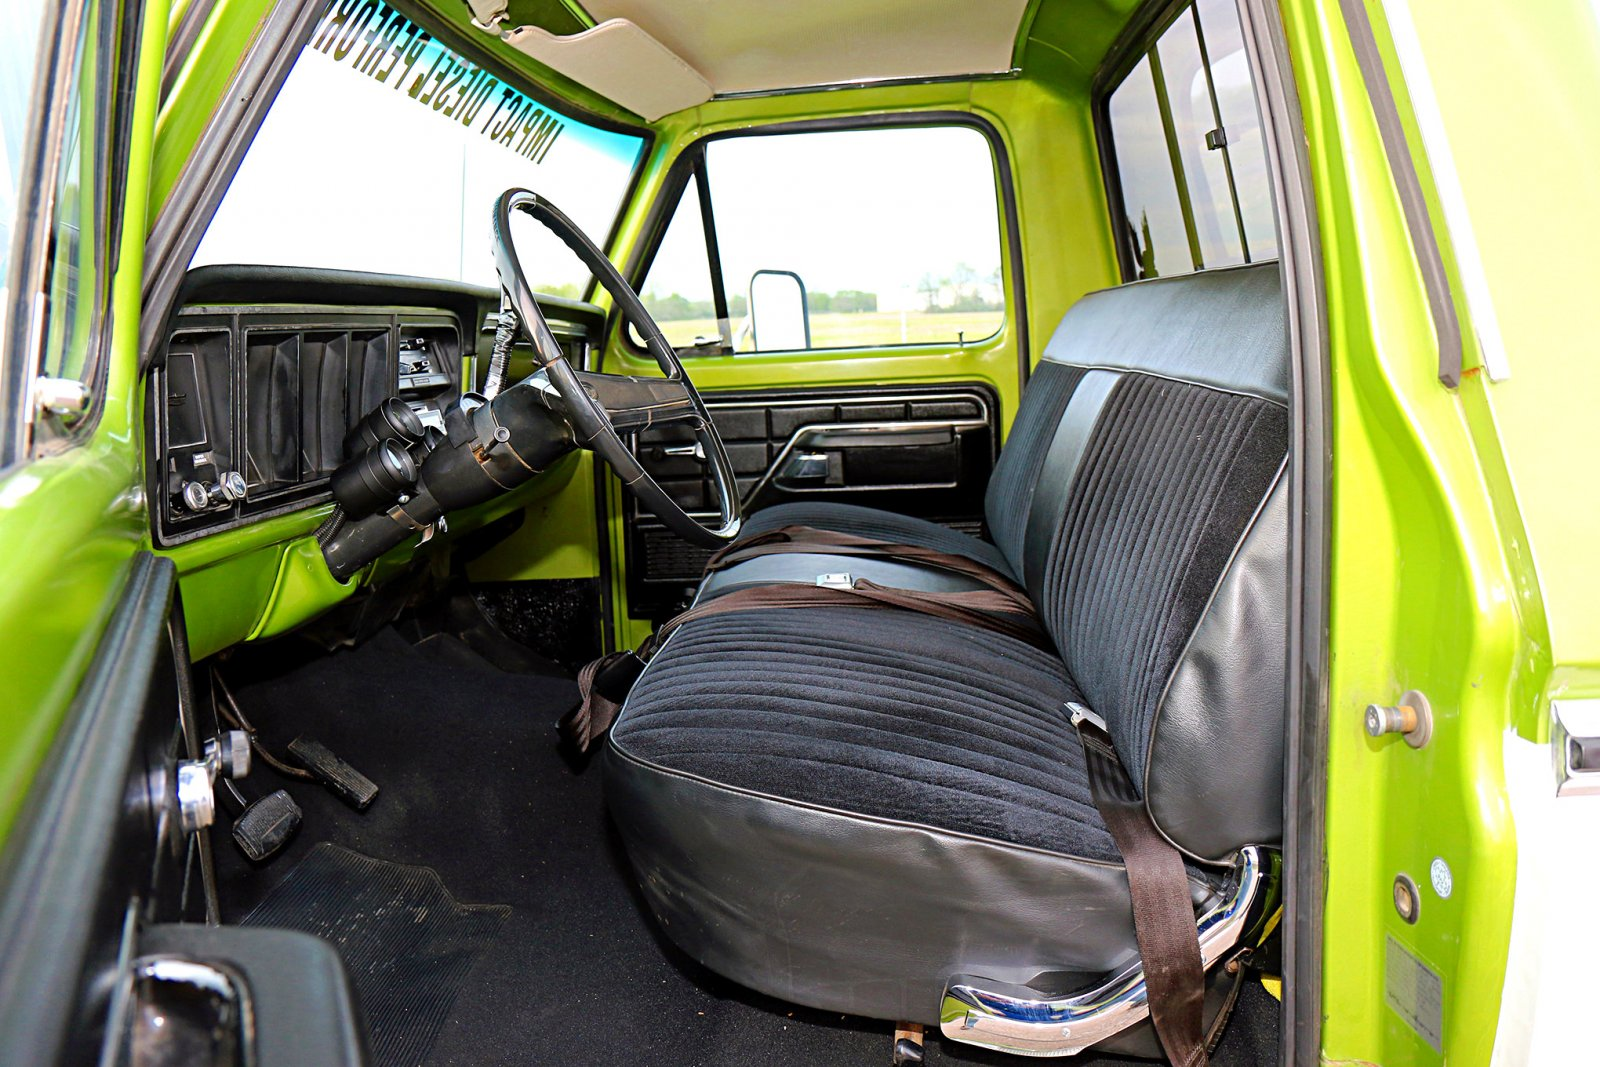 013-northern-ranger-interior.jpg